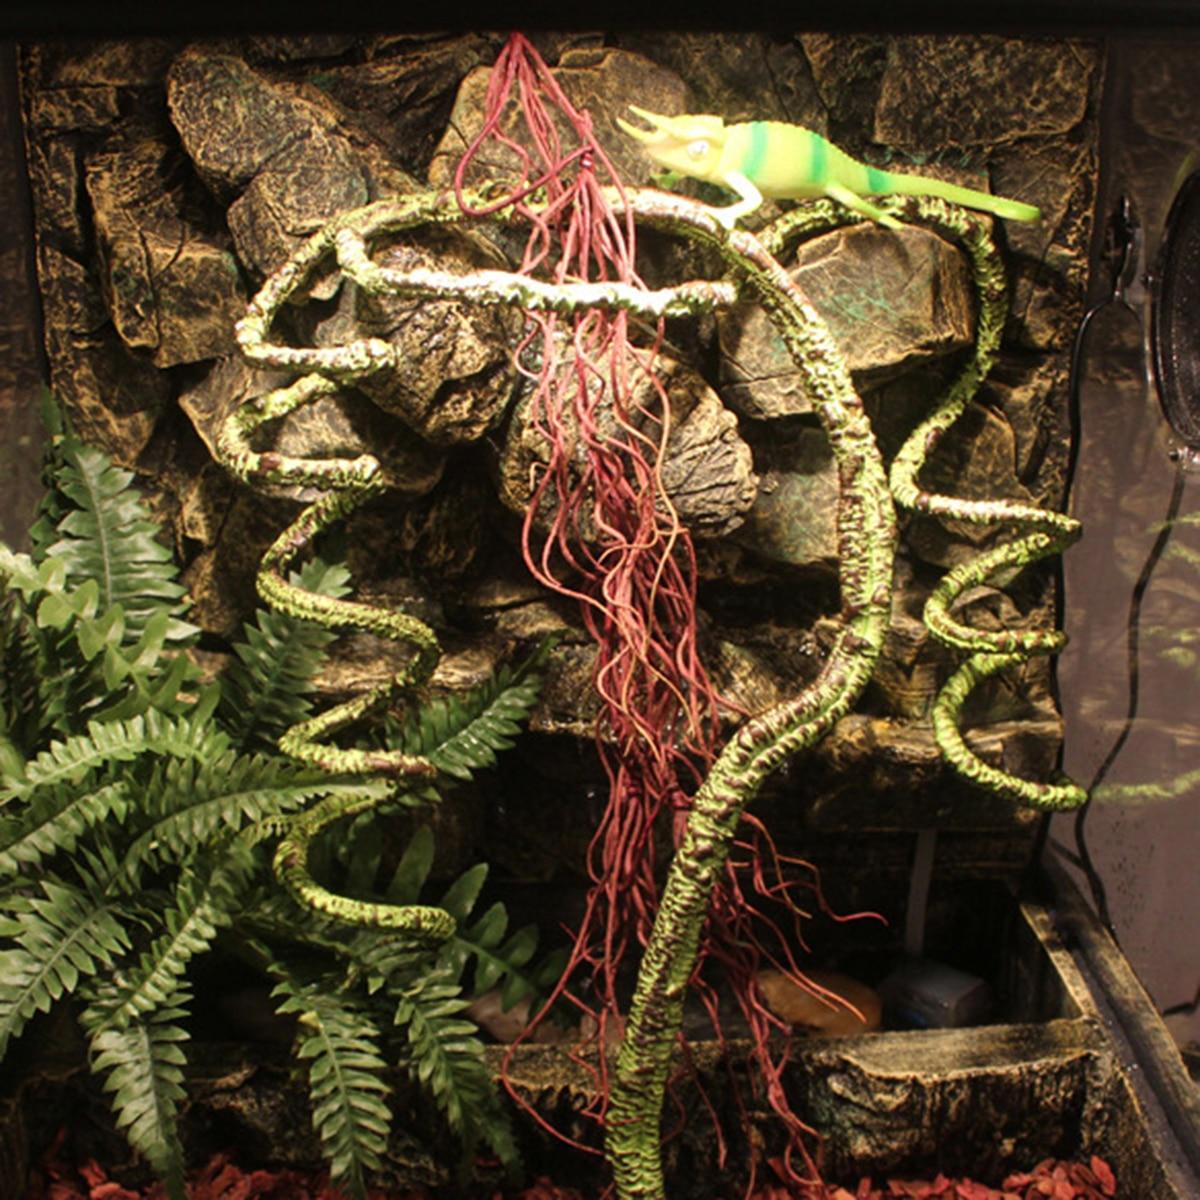 Green Reptiles Vine Lizard Climber Jungle Forest Artificial Branch 155/195cm Terrarium Cage Reptiles Habitat Decoration Supplies